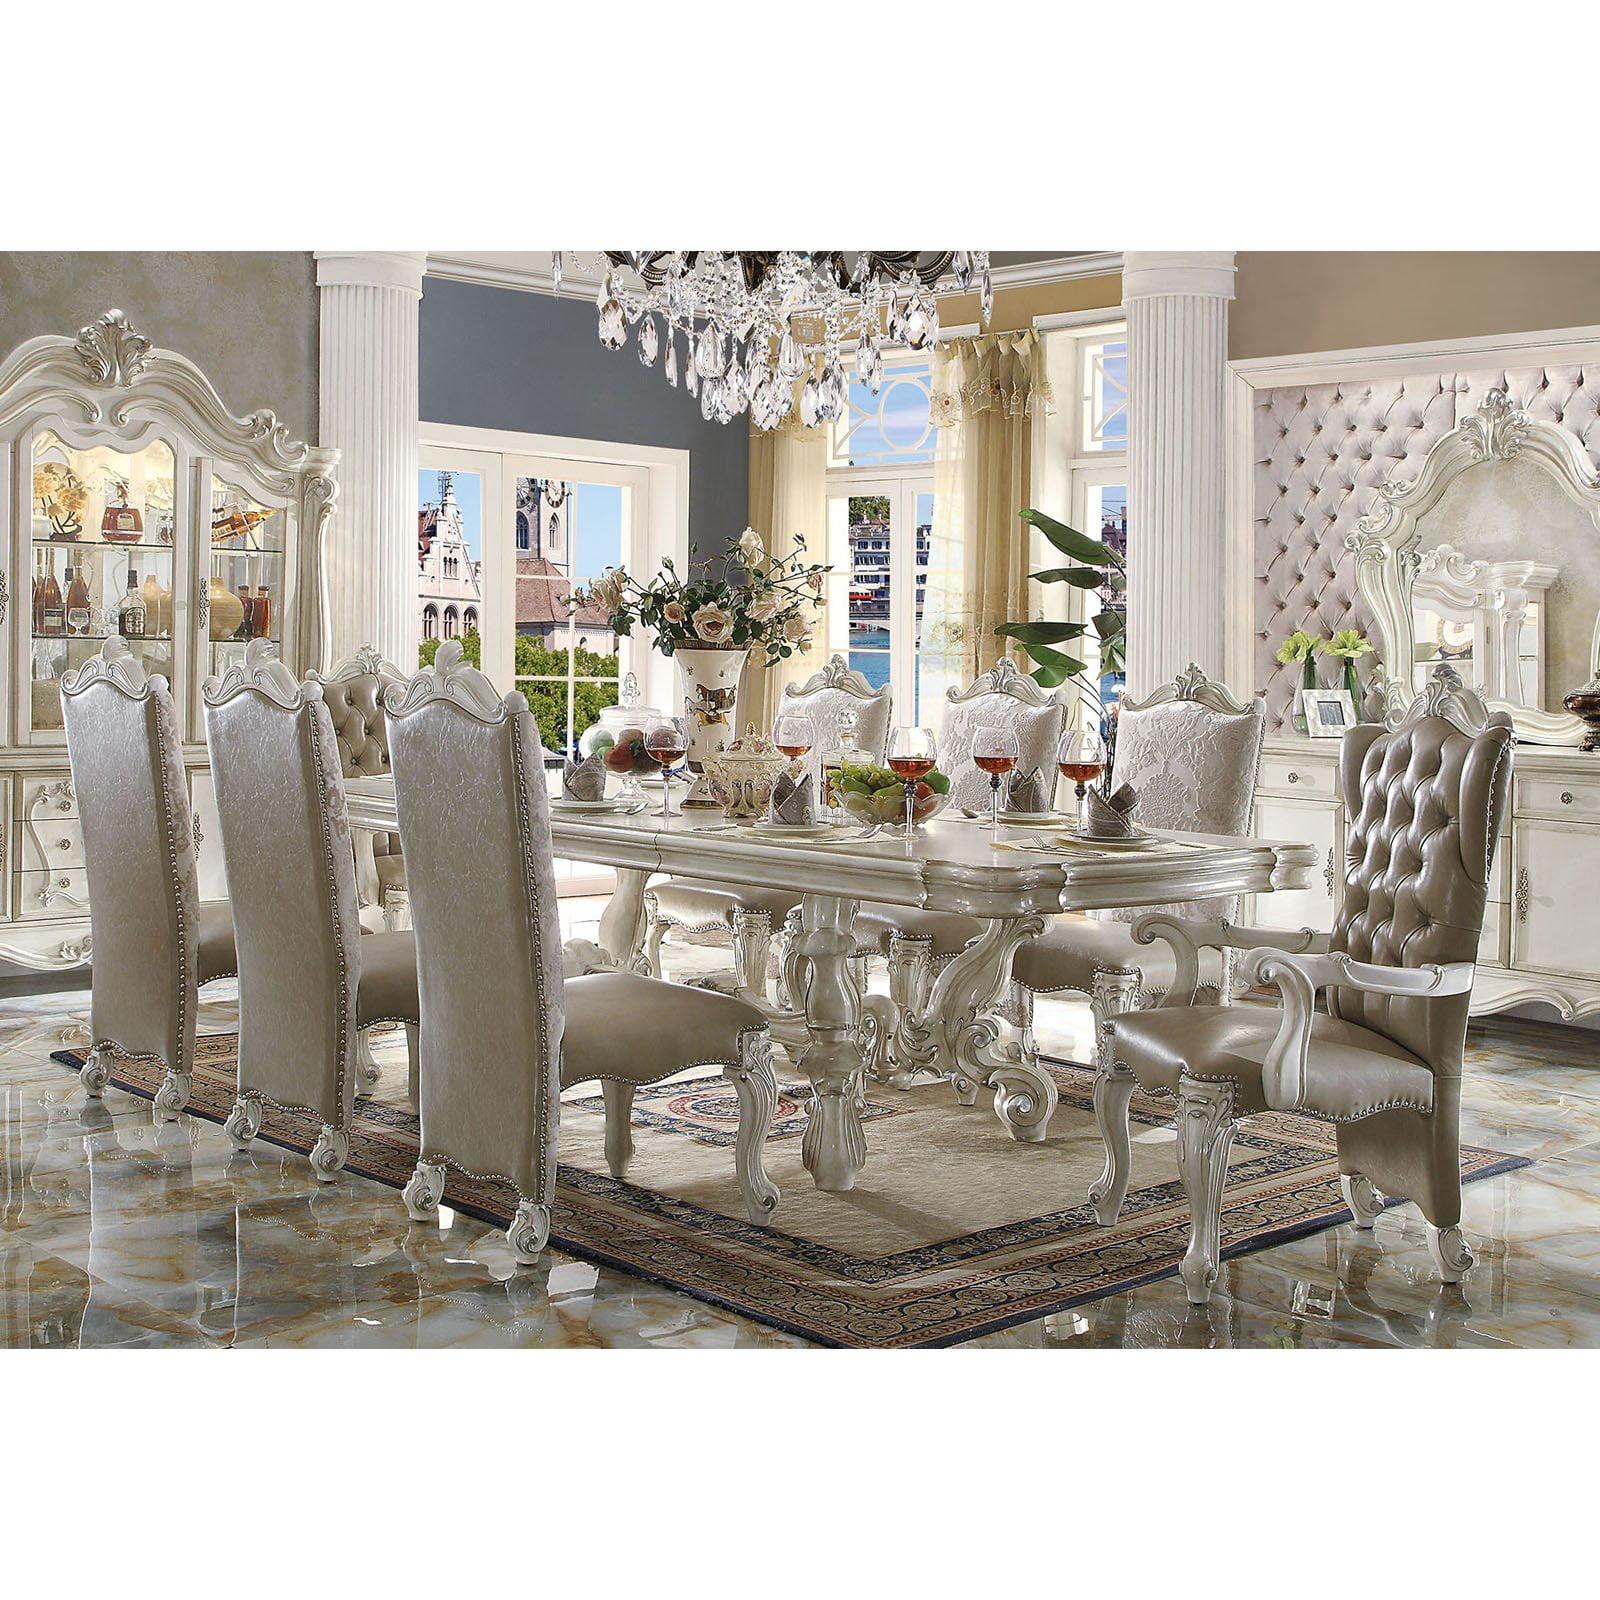 Acme Furniture Versailles Rectangular Pedestal Dining Table